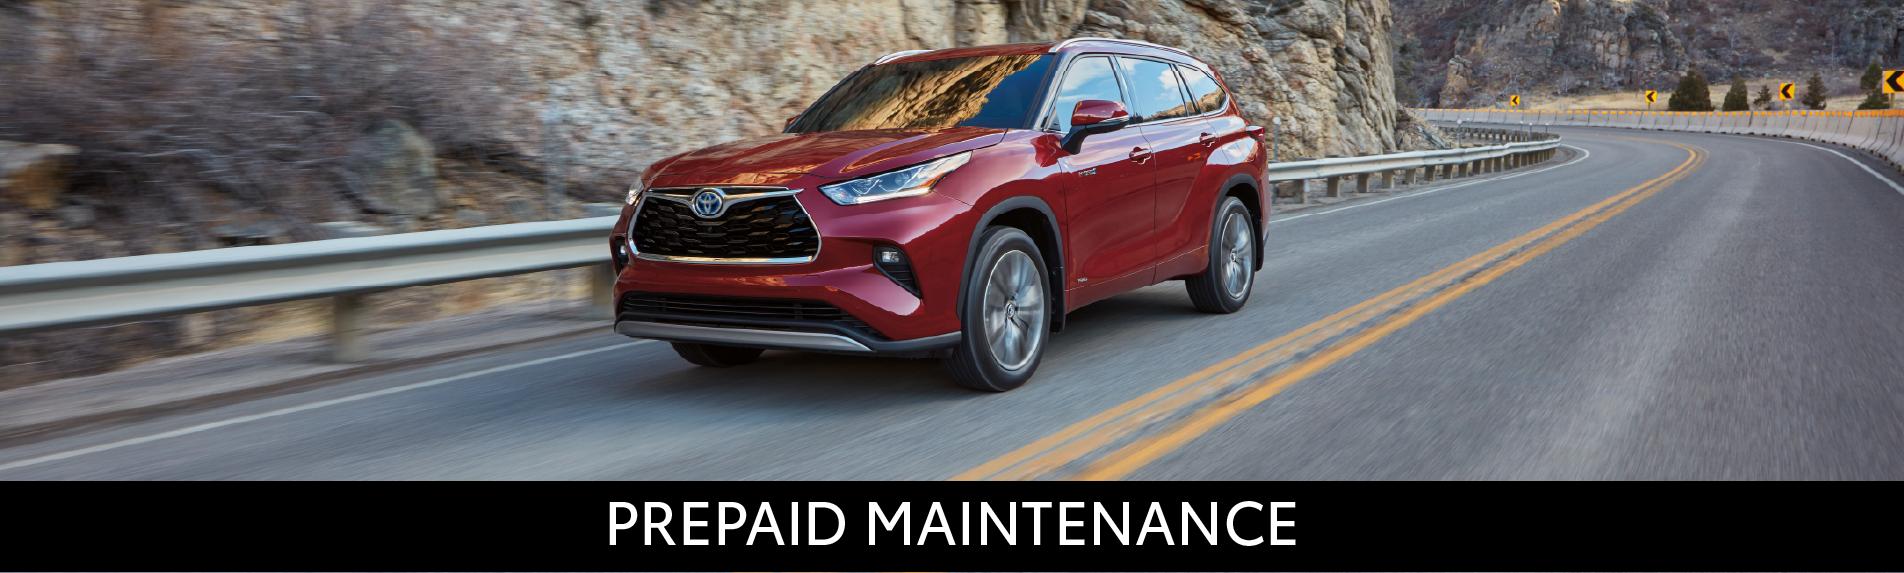 Midtown Toyota Pre paid maintenance